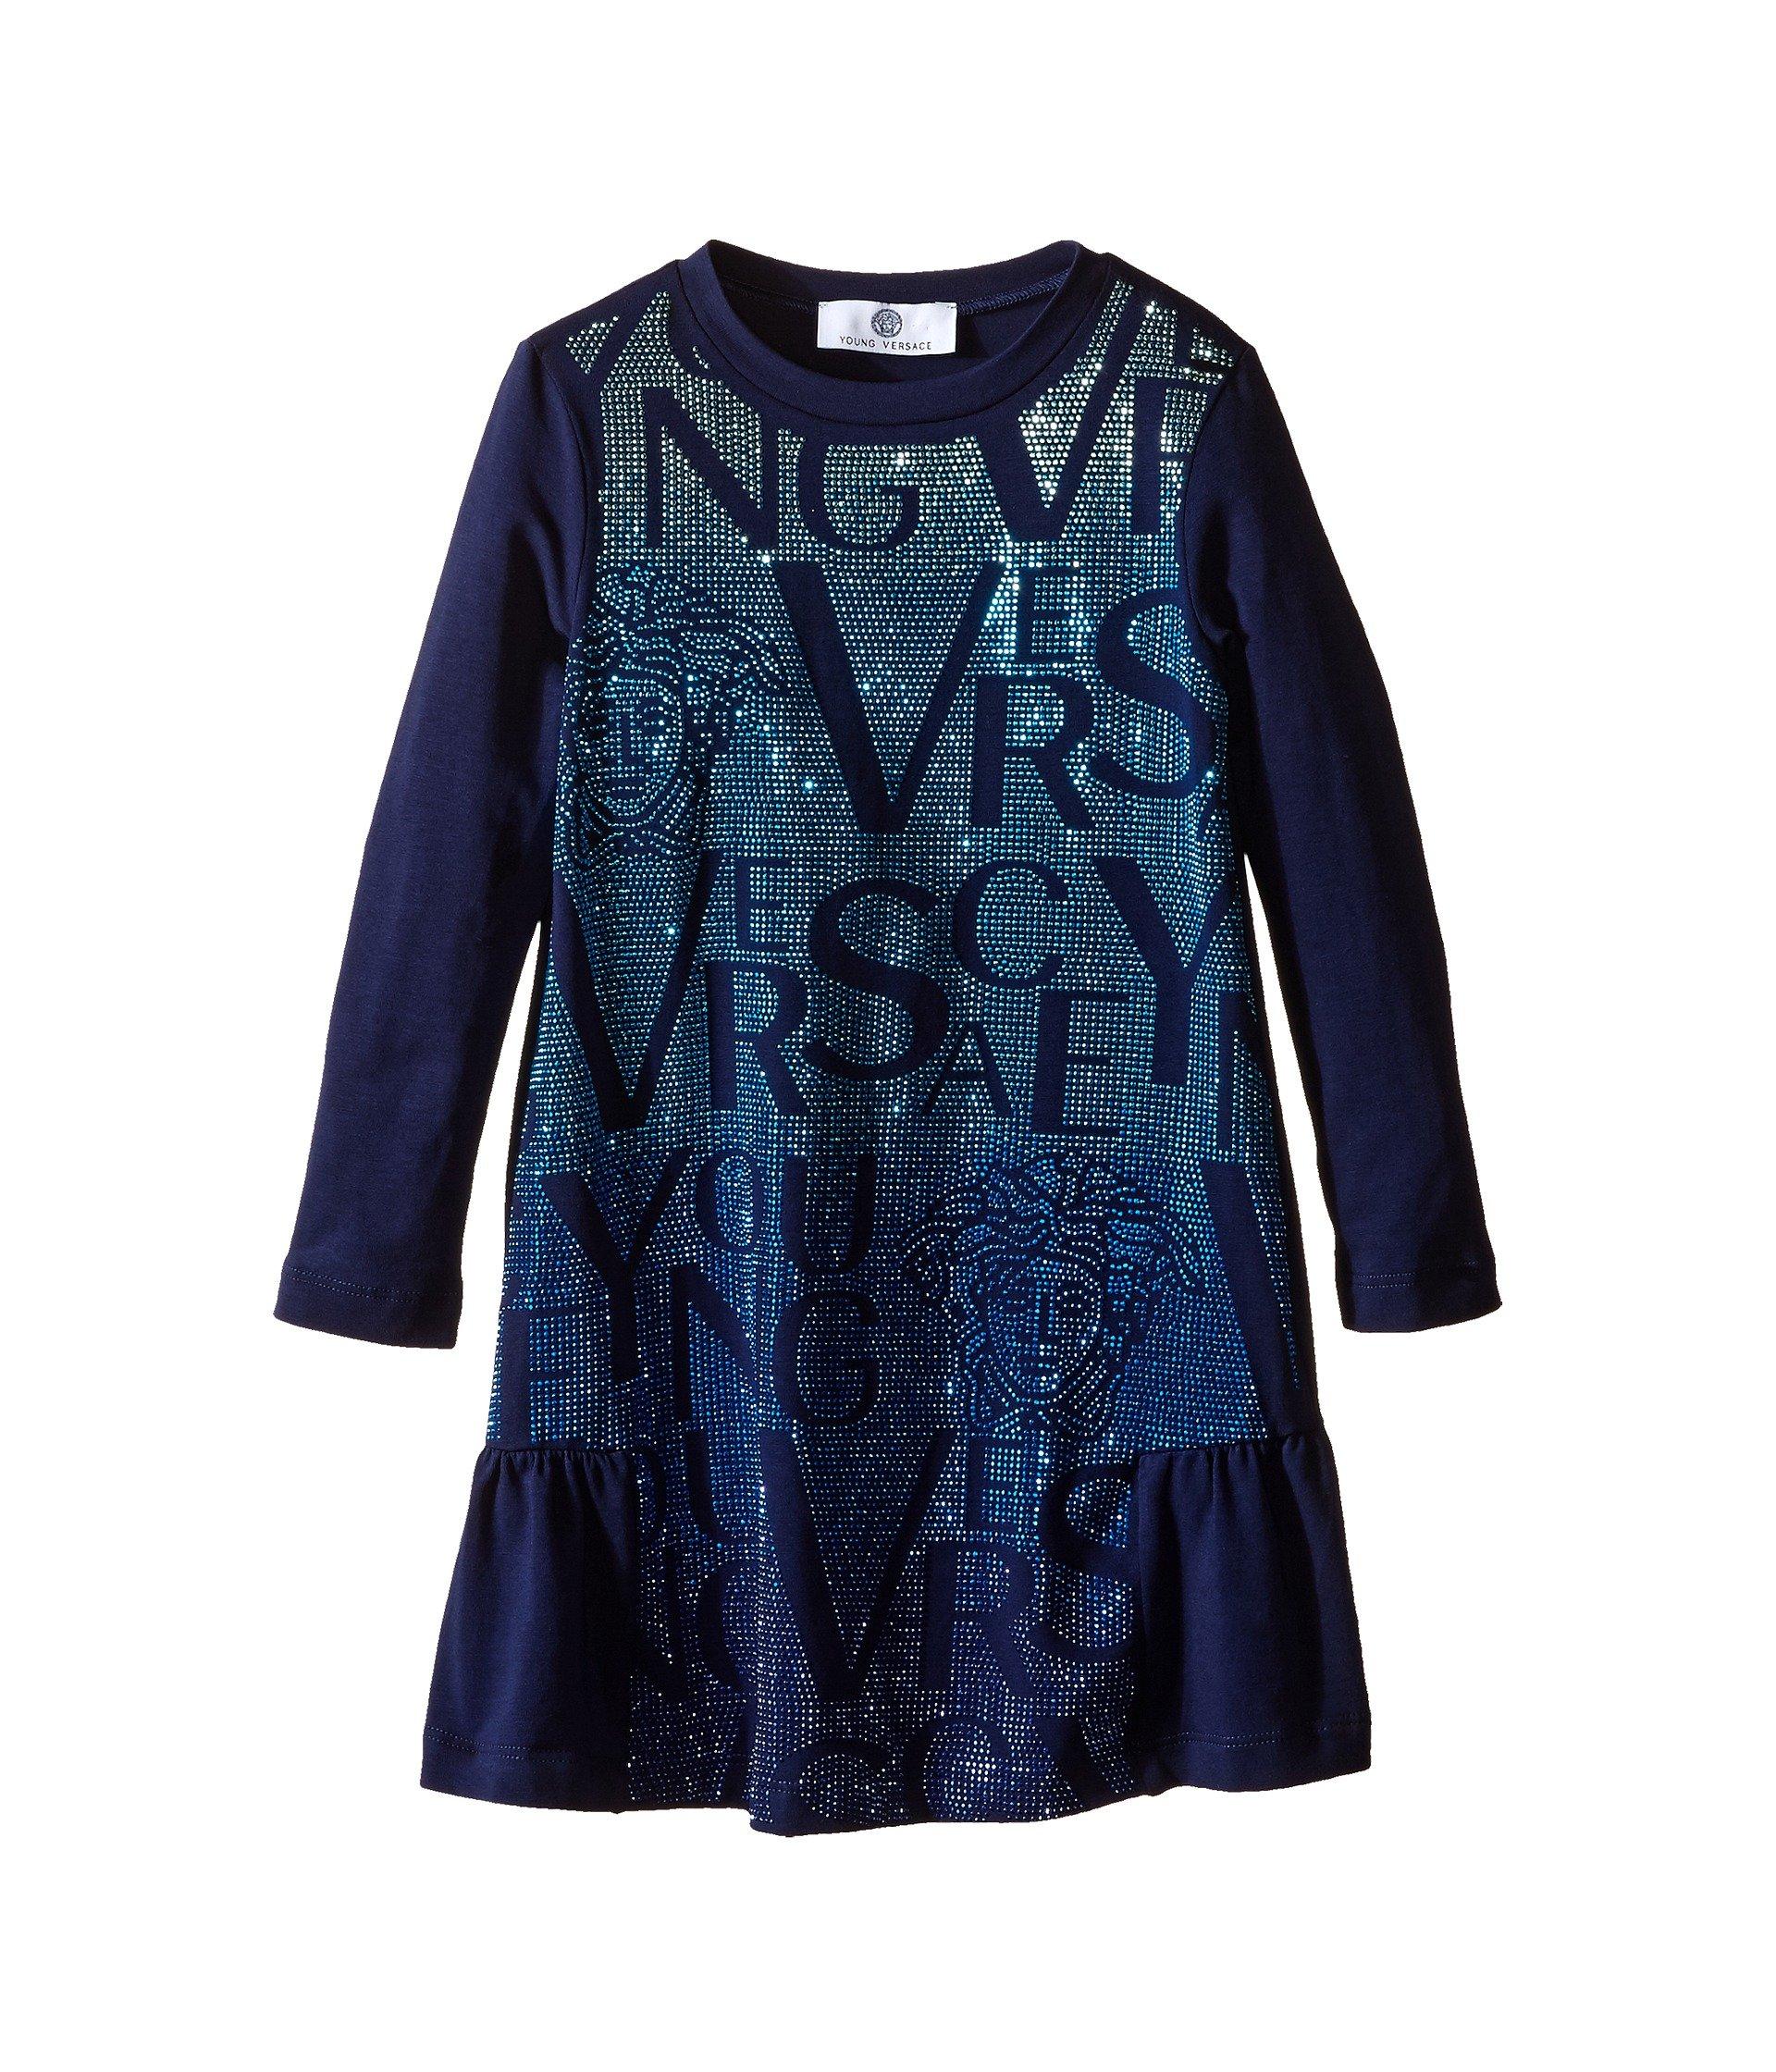 Vestido para Niña Versace Kids Long Sleeve Dress Lettering Details (Toddler/Little Kids)  + Versace en VeoyCompro.net